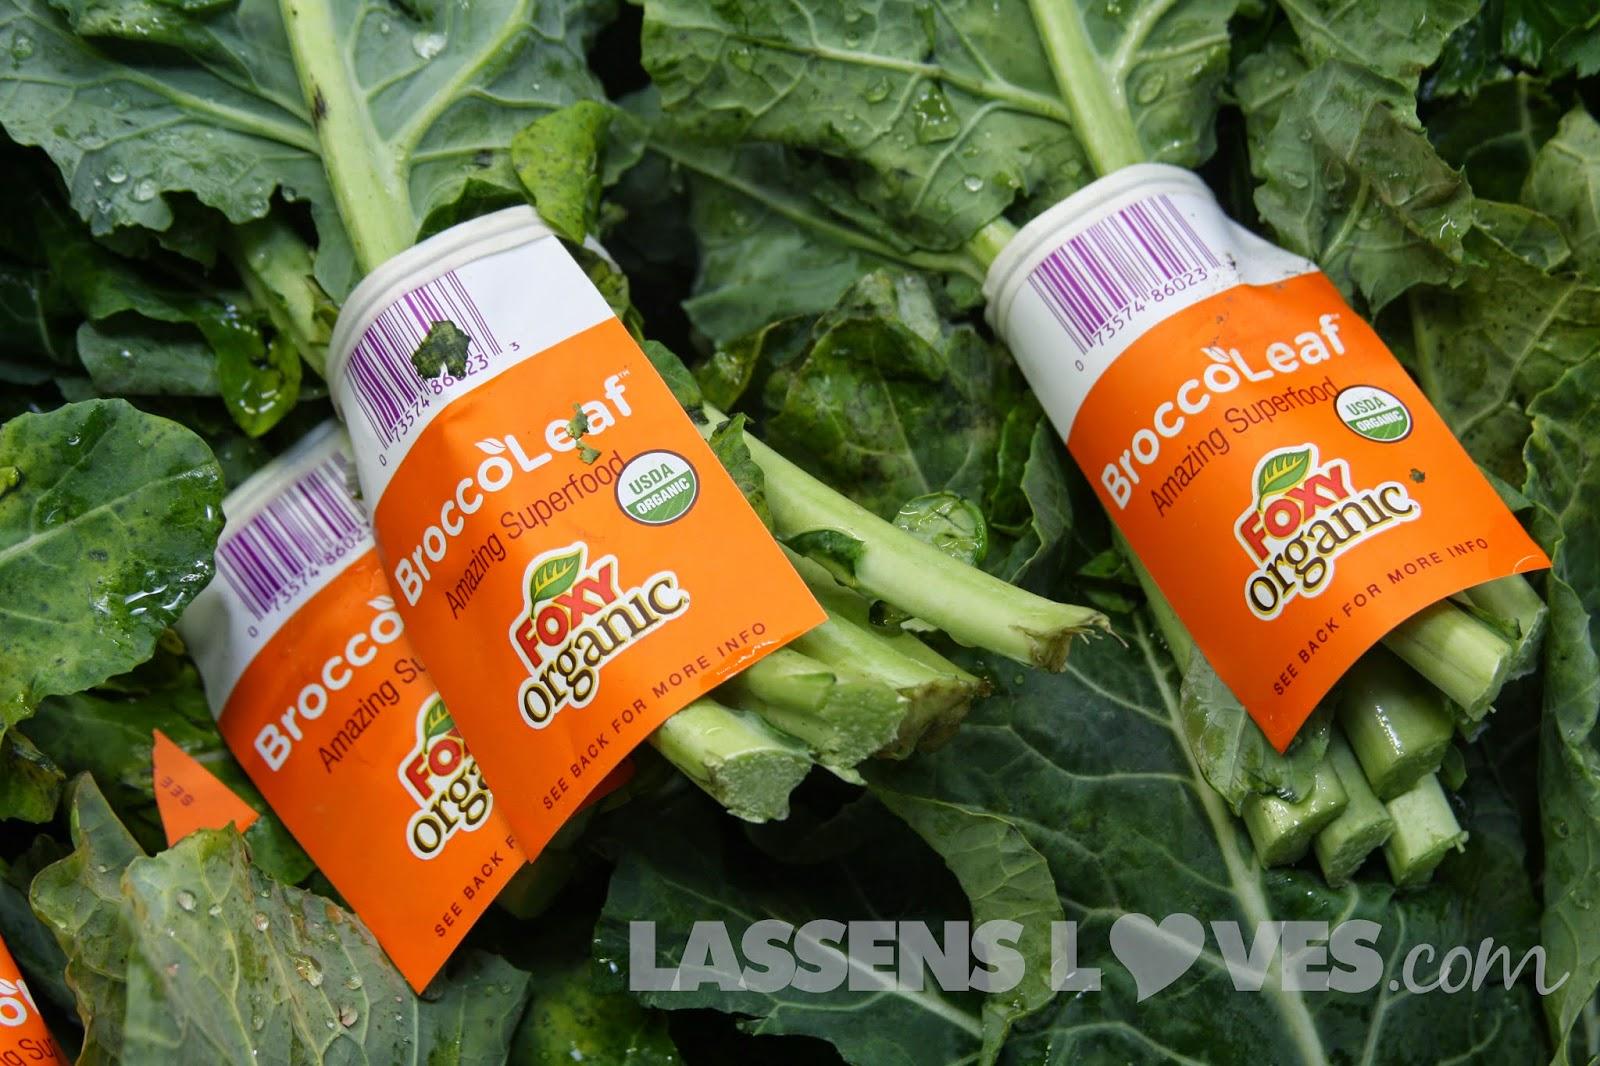 organic+produce, organic+broccoleaf, broccoleaf recipes